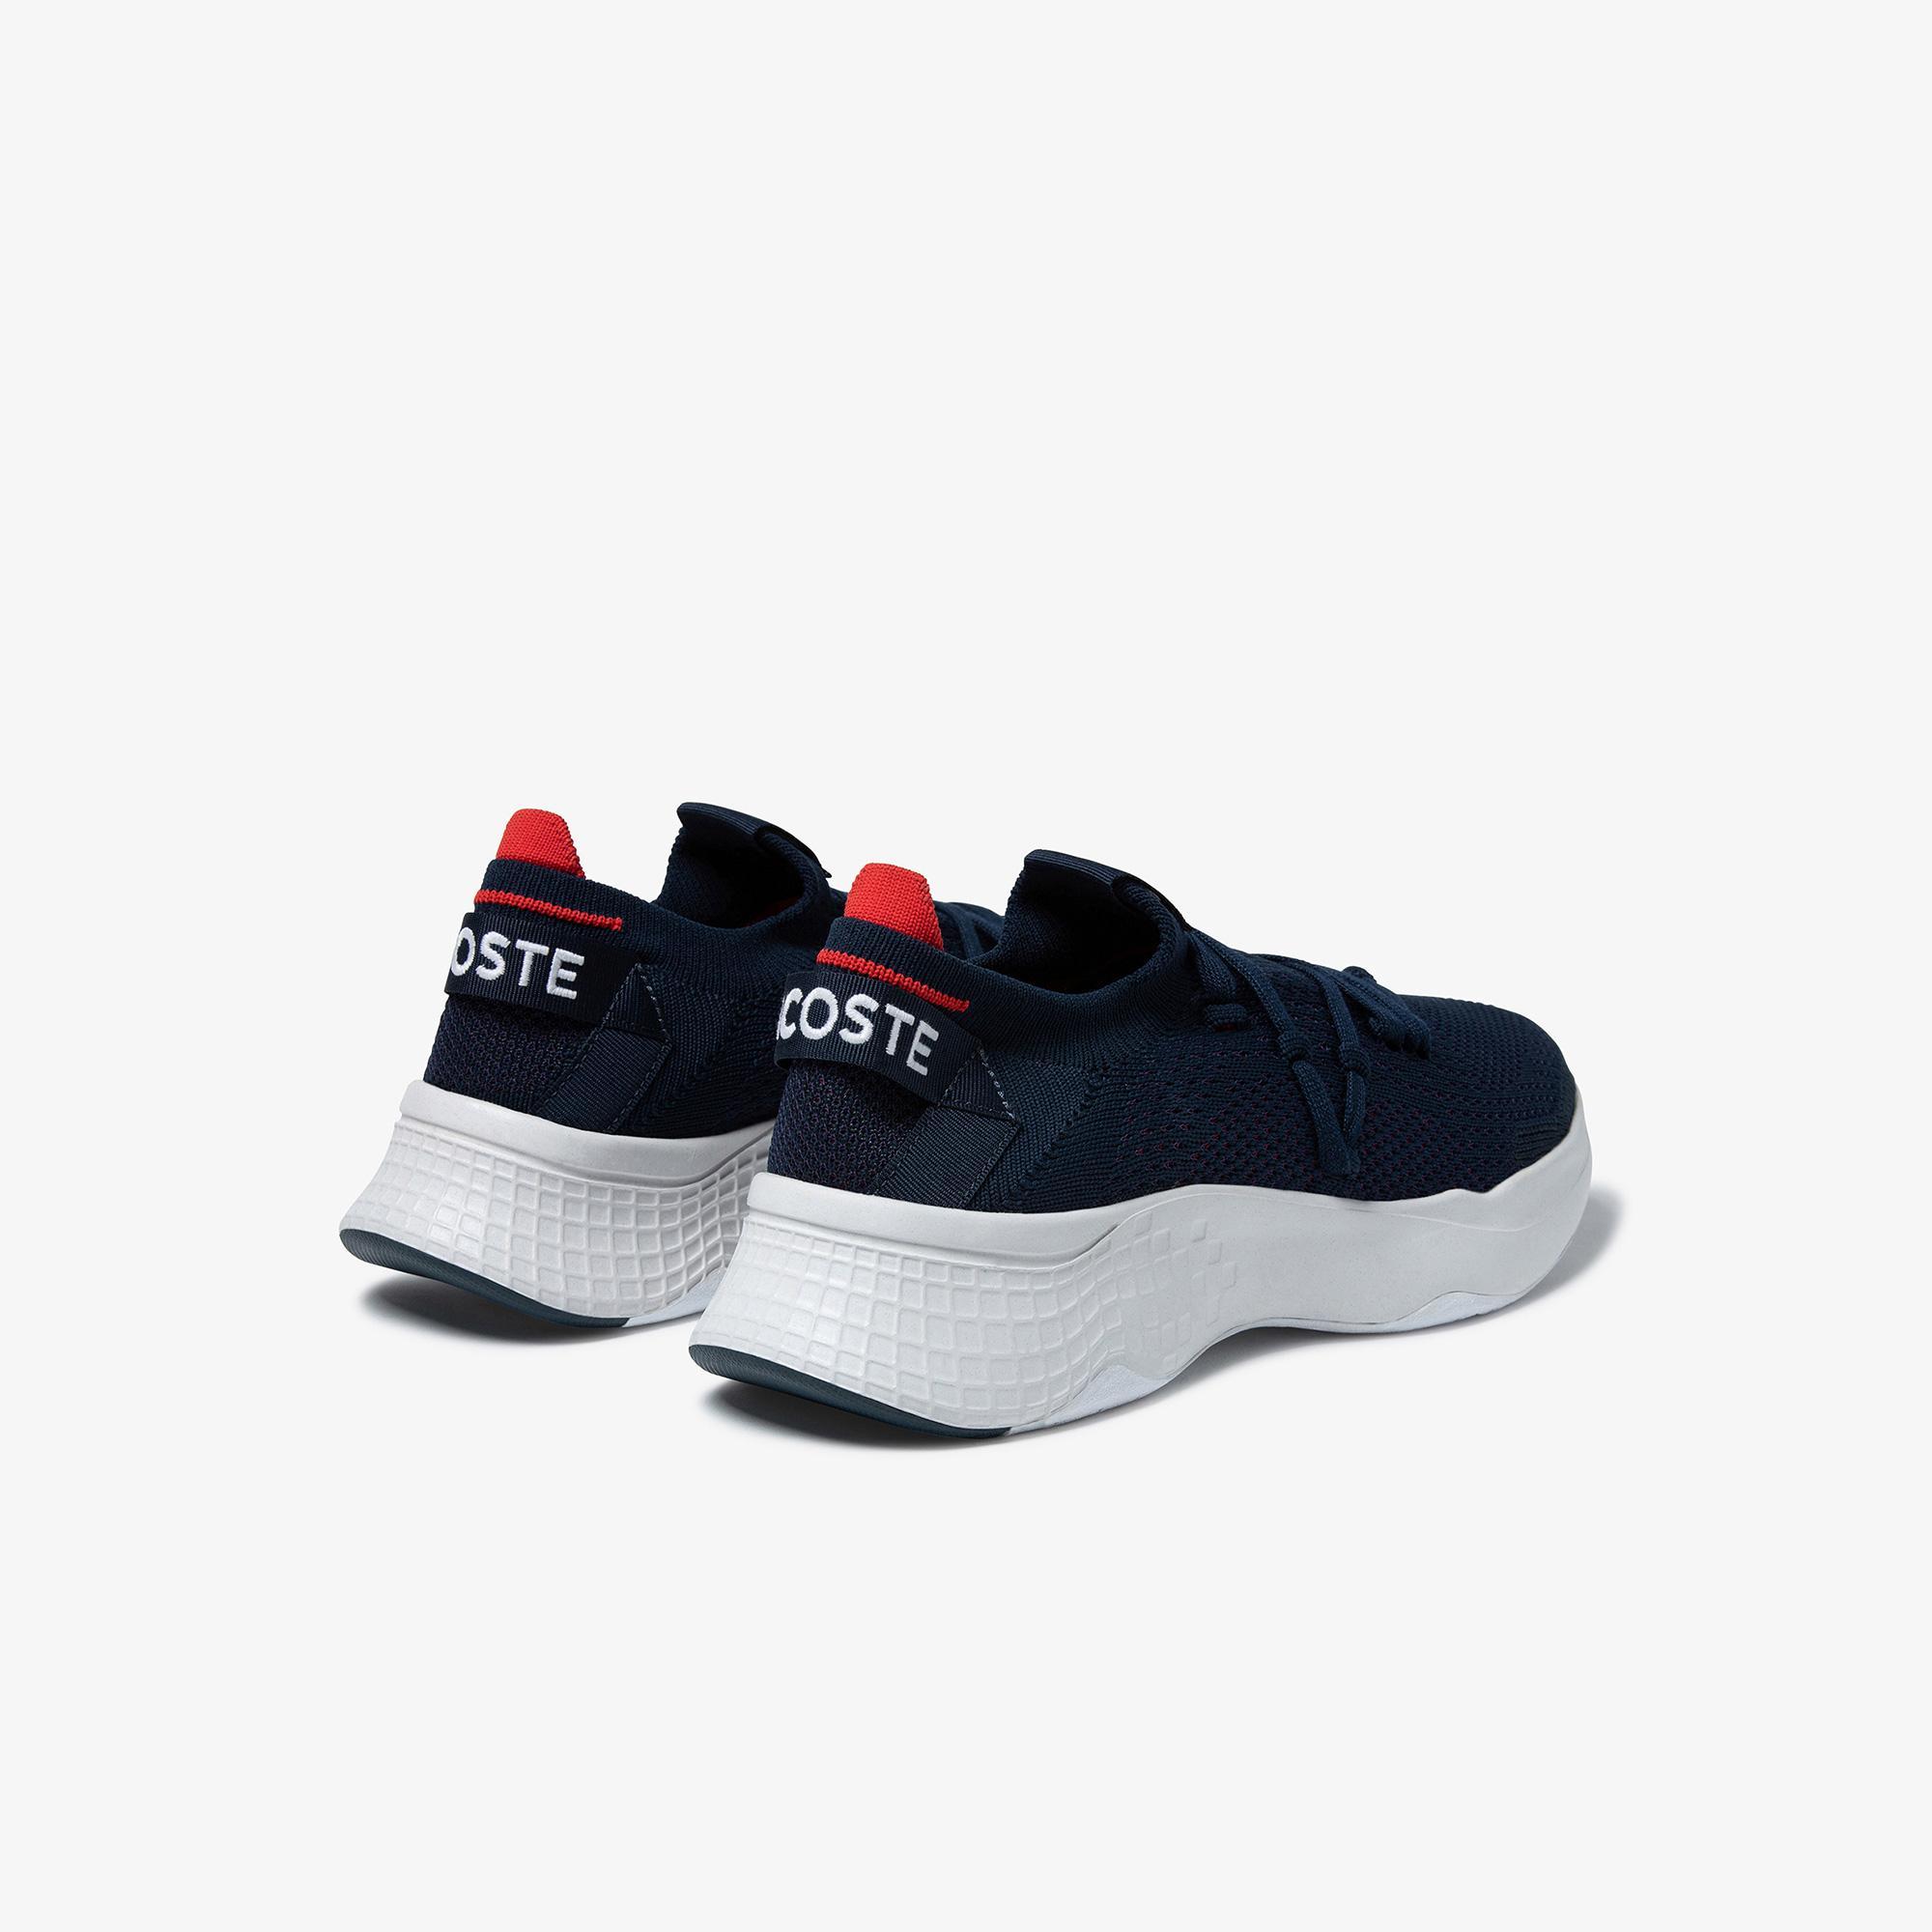 Lacoste Court-Drive Knit 0121 2 Sma Erkek Lacivert - Kırmızı Sneaker